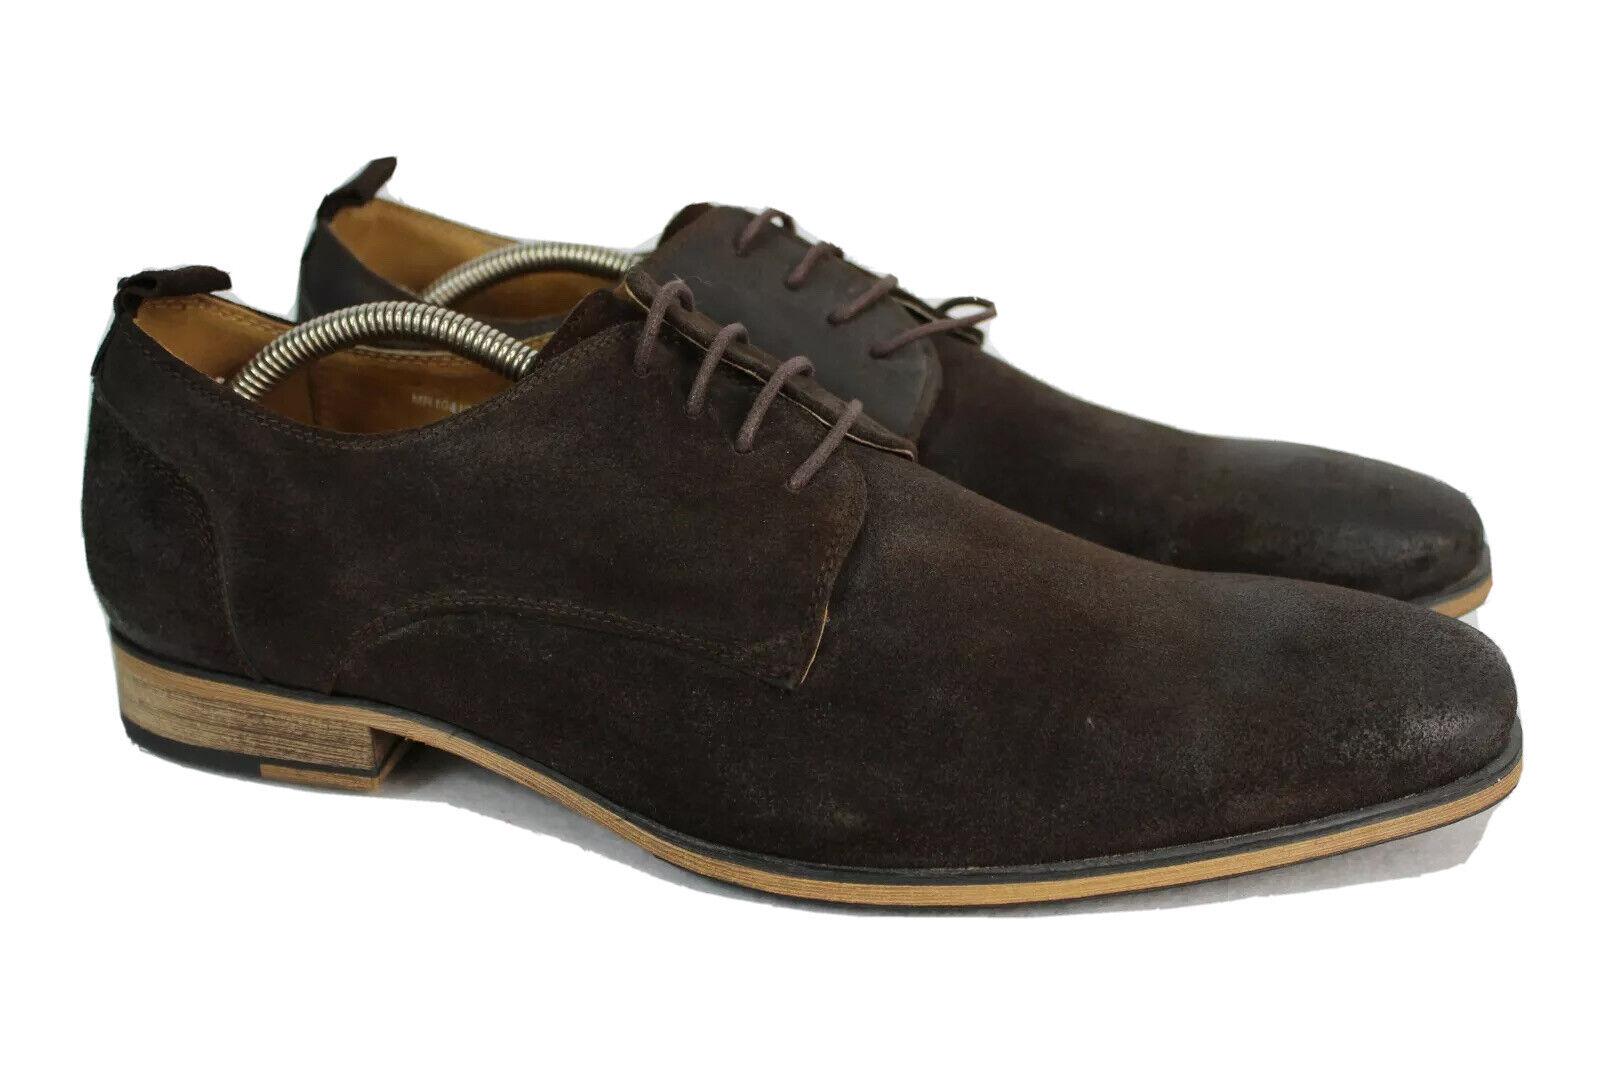 NWOB Kenneth Cole Reaction Men's Running Streak Brown Suede Dress Shoes 12M